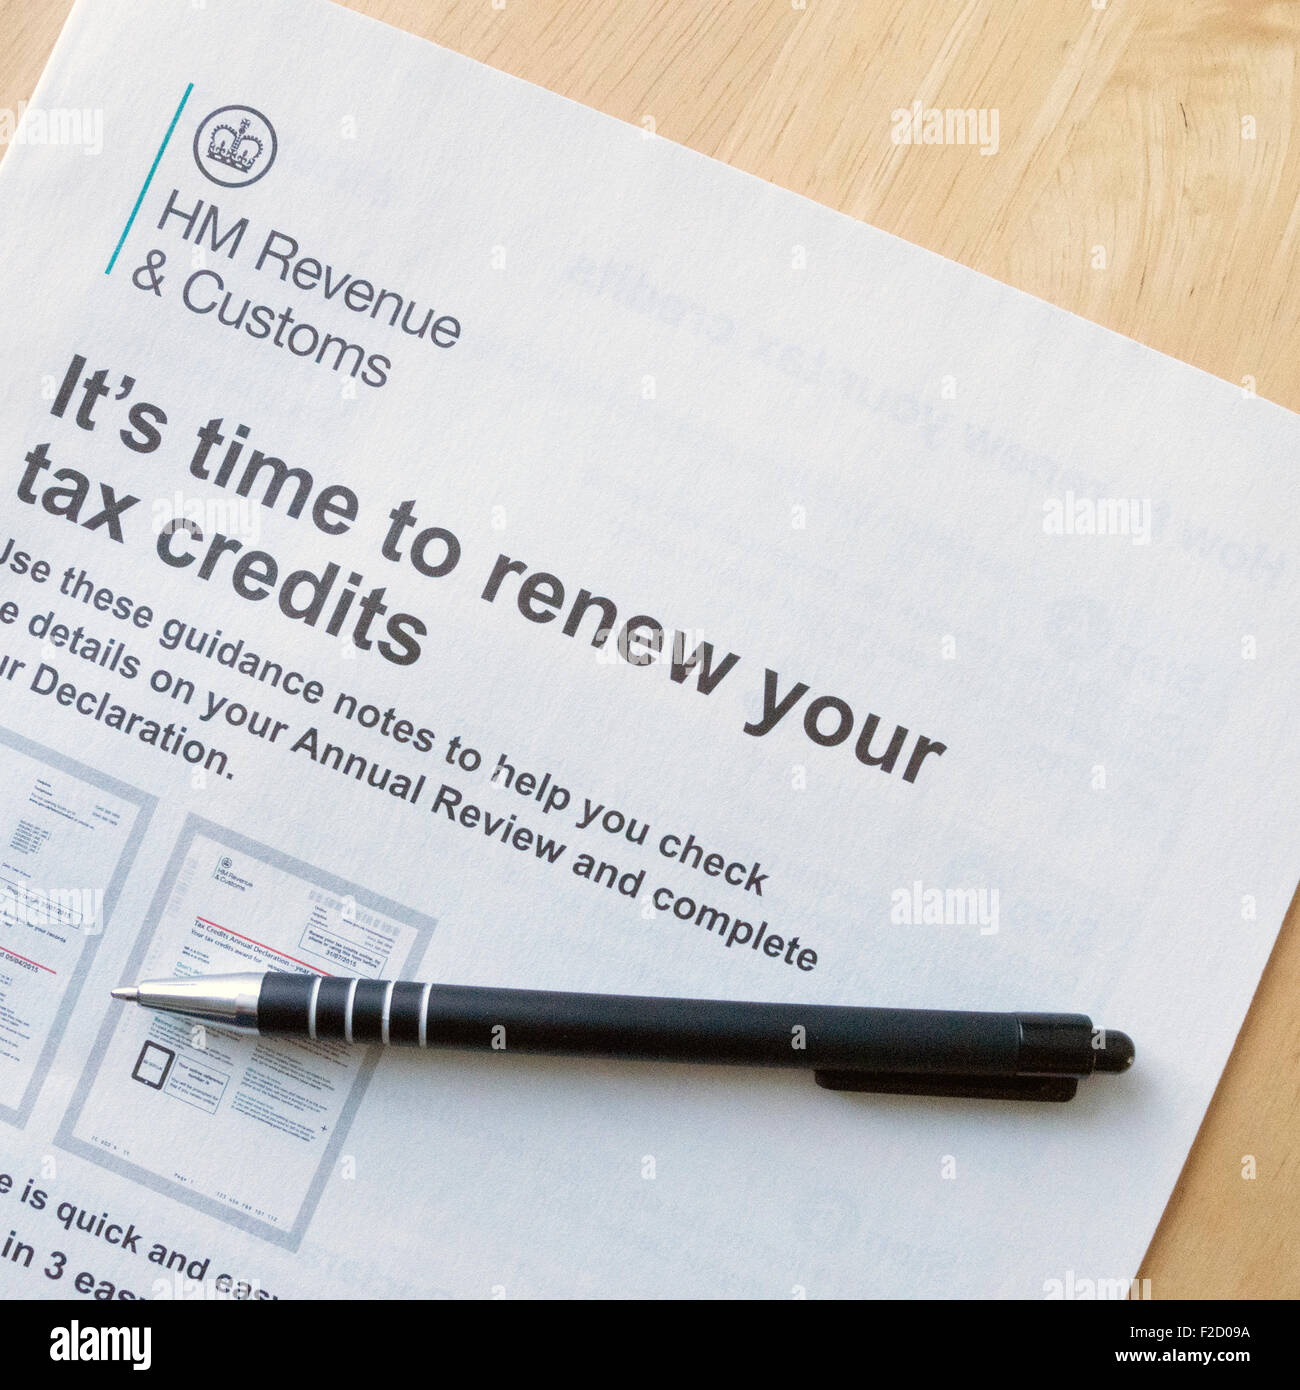 HMRC Tax Credits Renewal Form Guidance Notes, UK - Stock Image